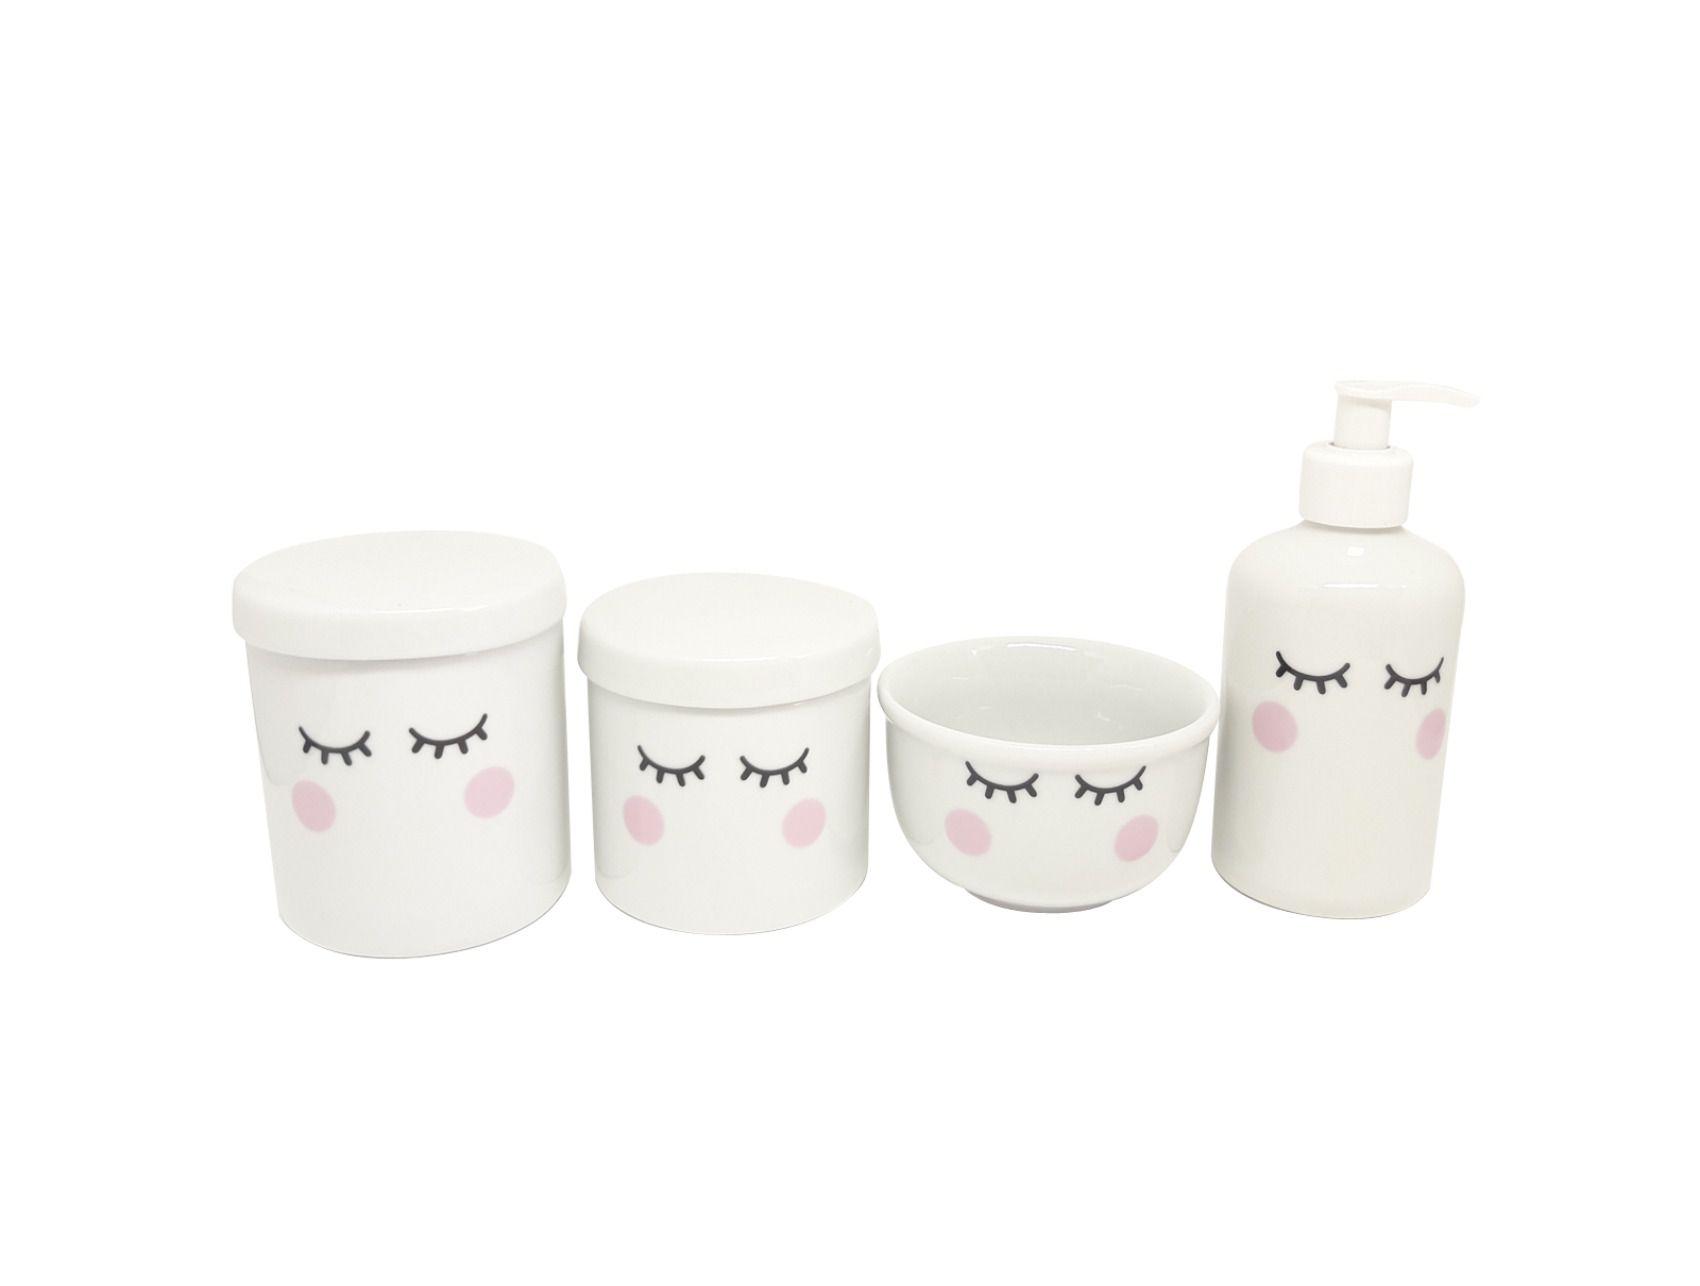 Kit Higiene Bebê Porcelana | Olhinhos Cílios Rosa | 4 peças